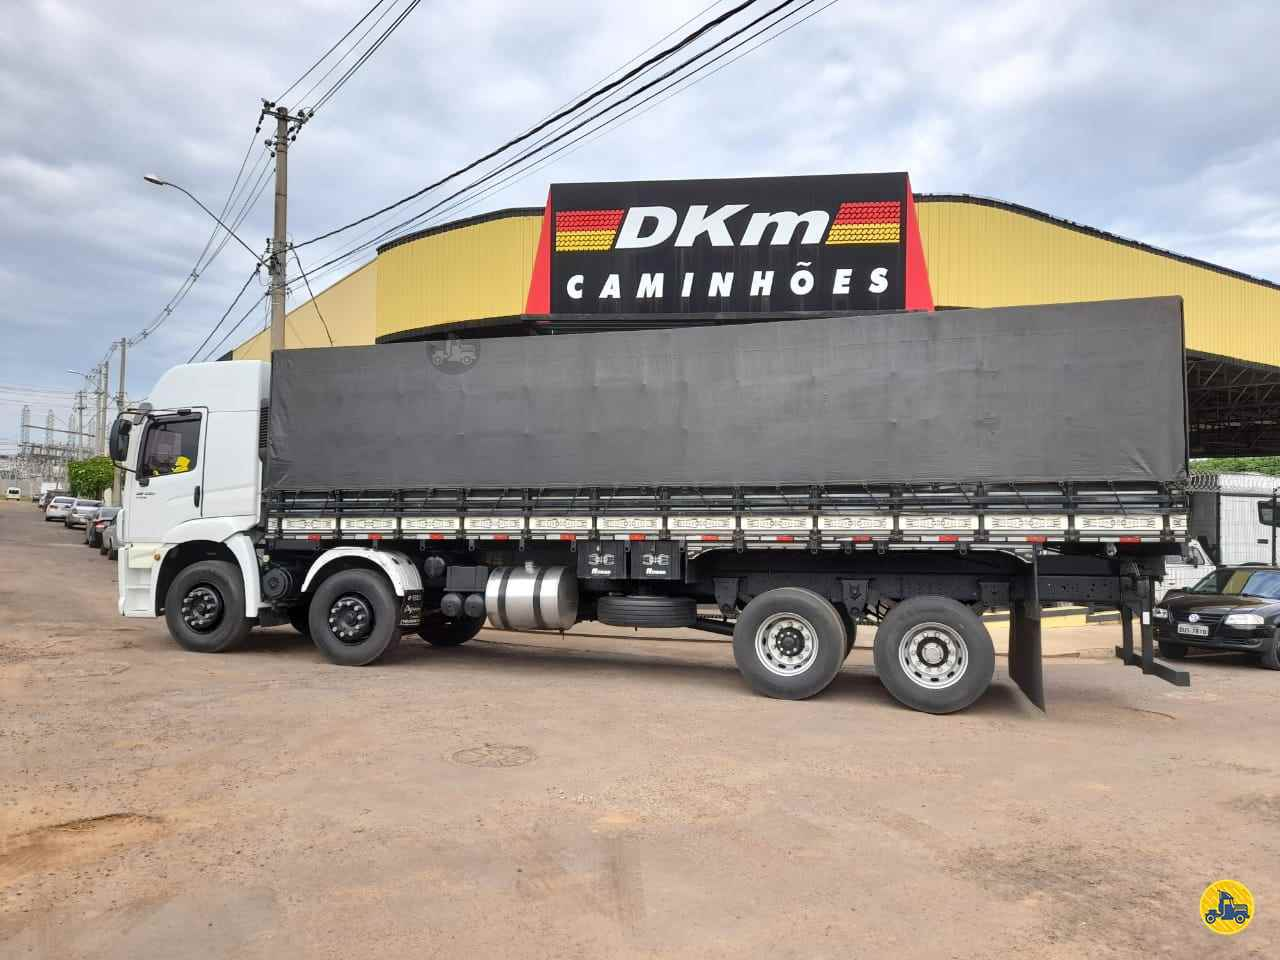 VOLKSWAGEN VW 25320 838000km 2011/2012 DKM Caminhões